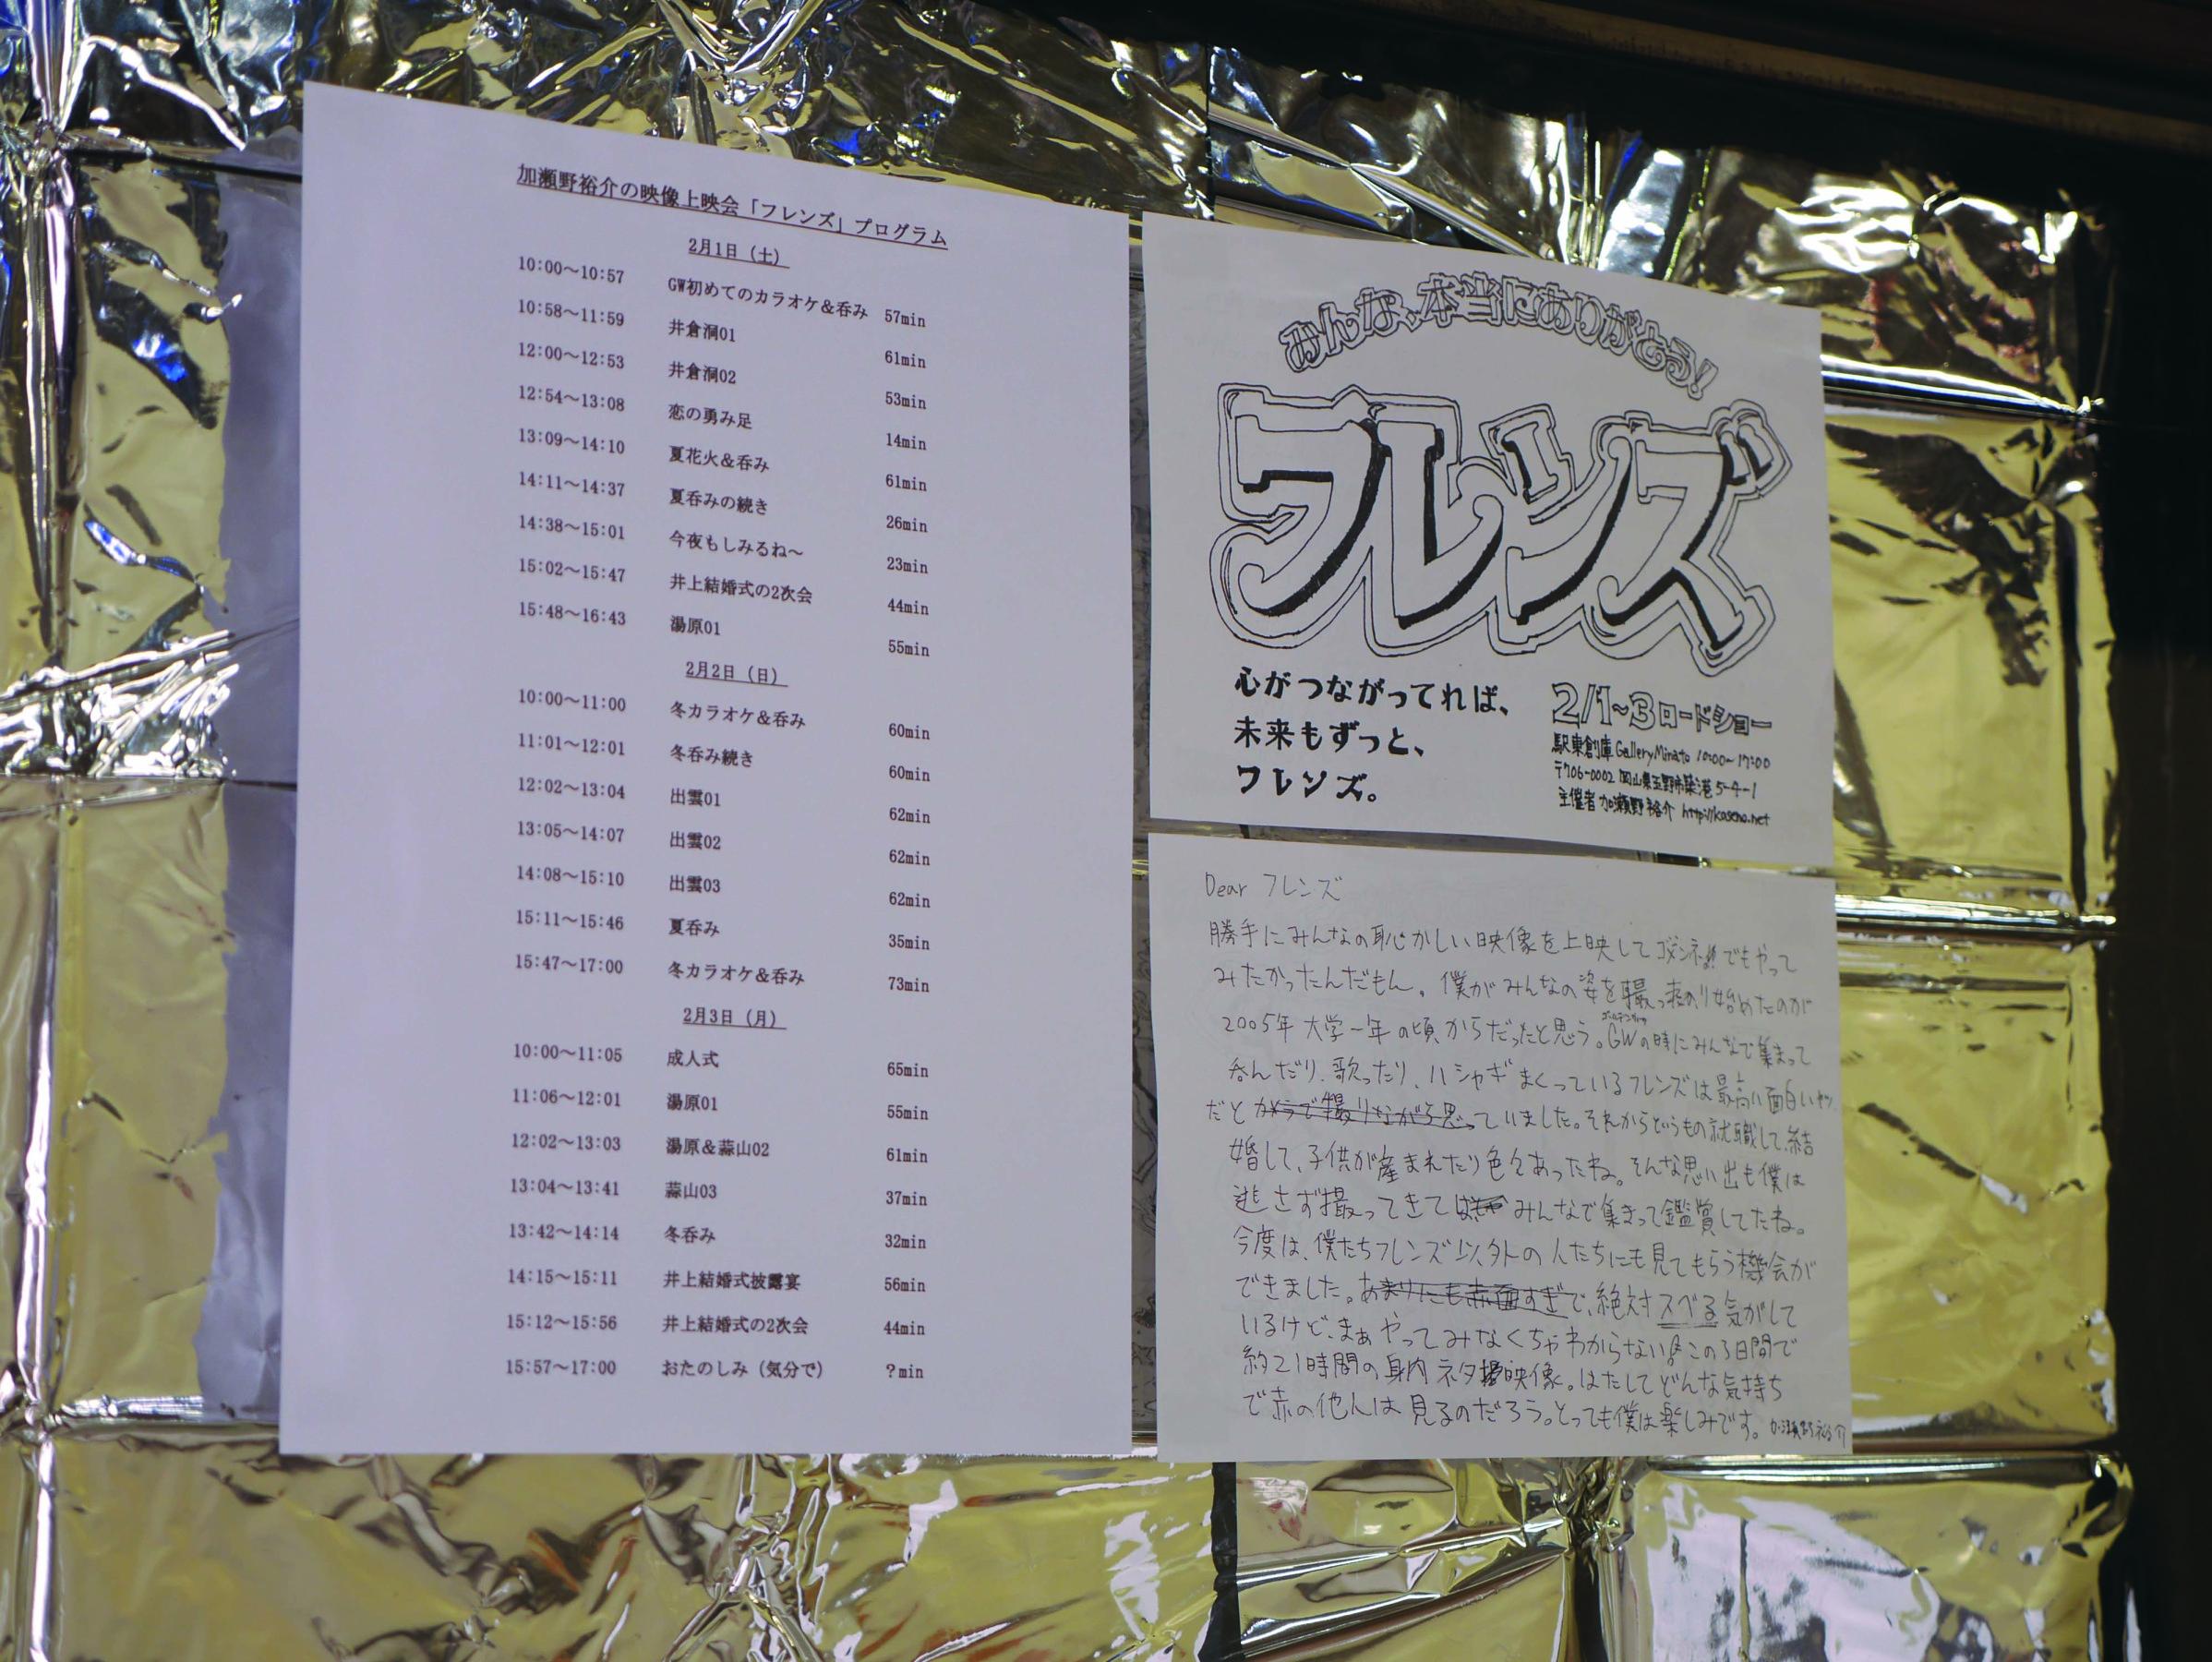 P1020110-1